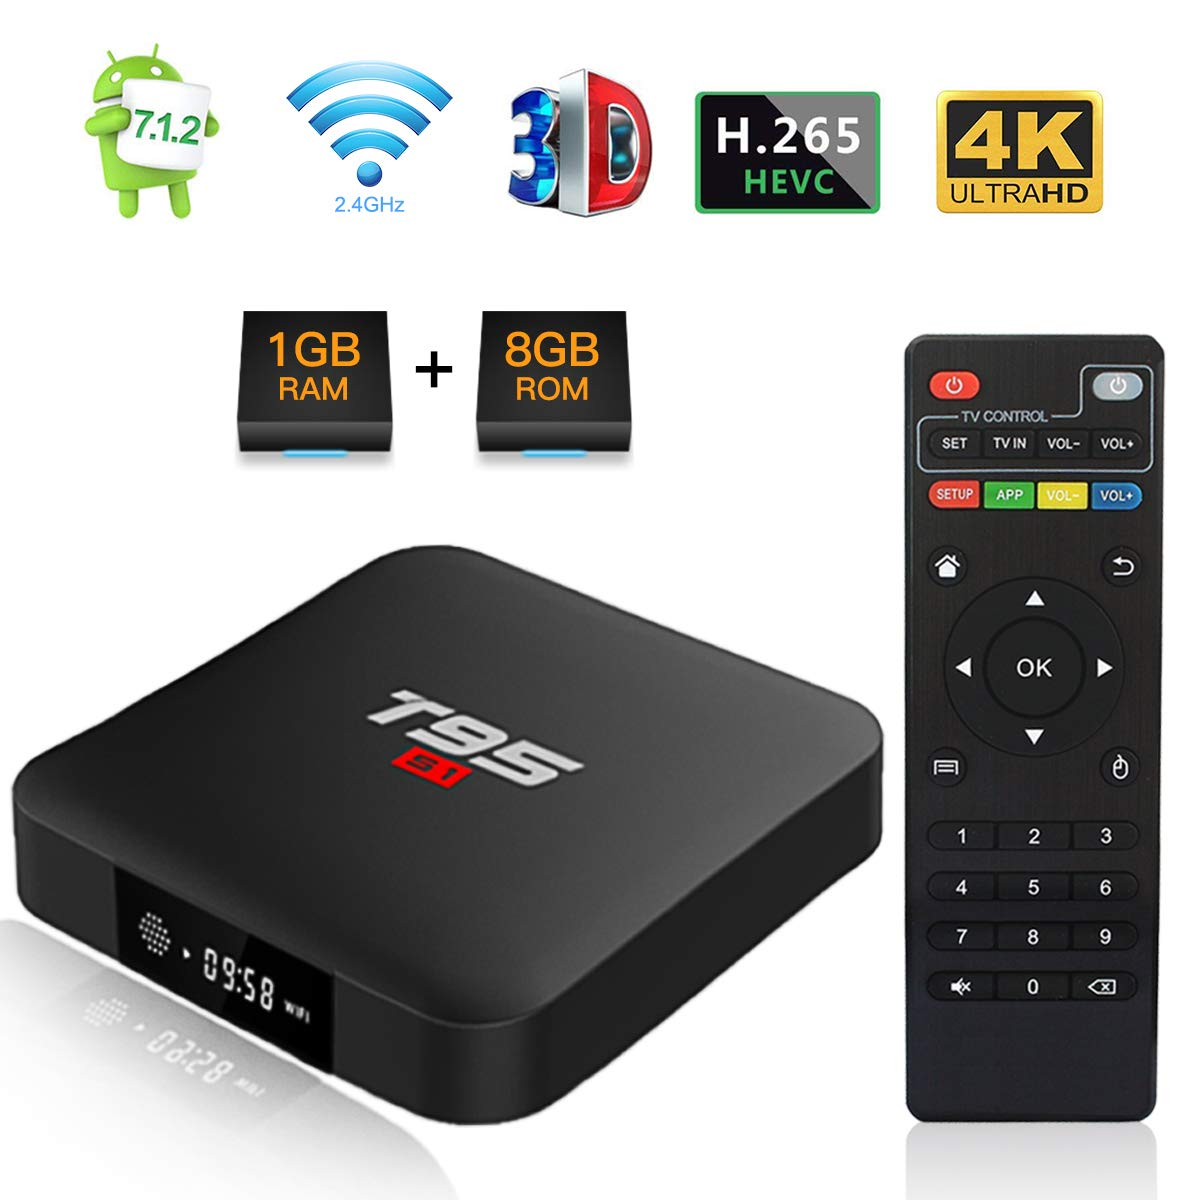 Android TV BOX, T95 S1 TV BOX 1GB RAM/8GB ROM Android 7.1 Amlogic S905W Quad Core Soporte 2.4Ghz WiFi H.265 4K HDMI DLNA Mini TV BOX HaiFen